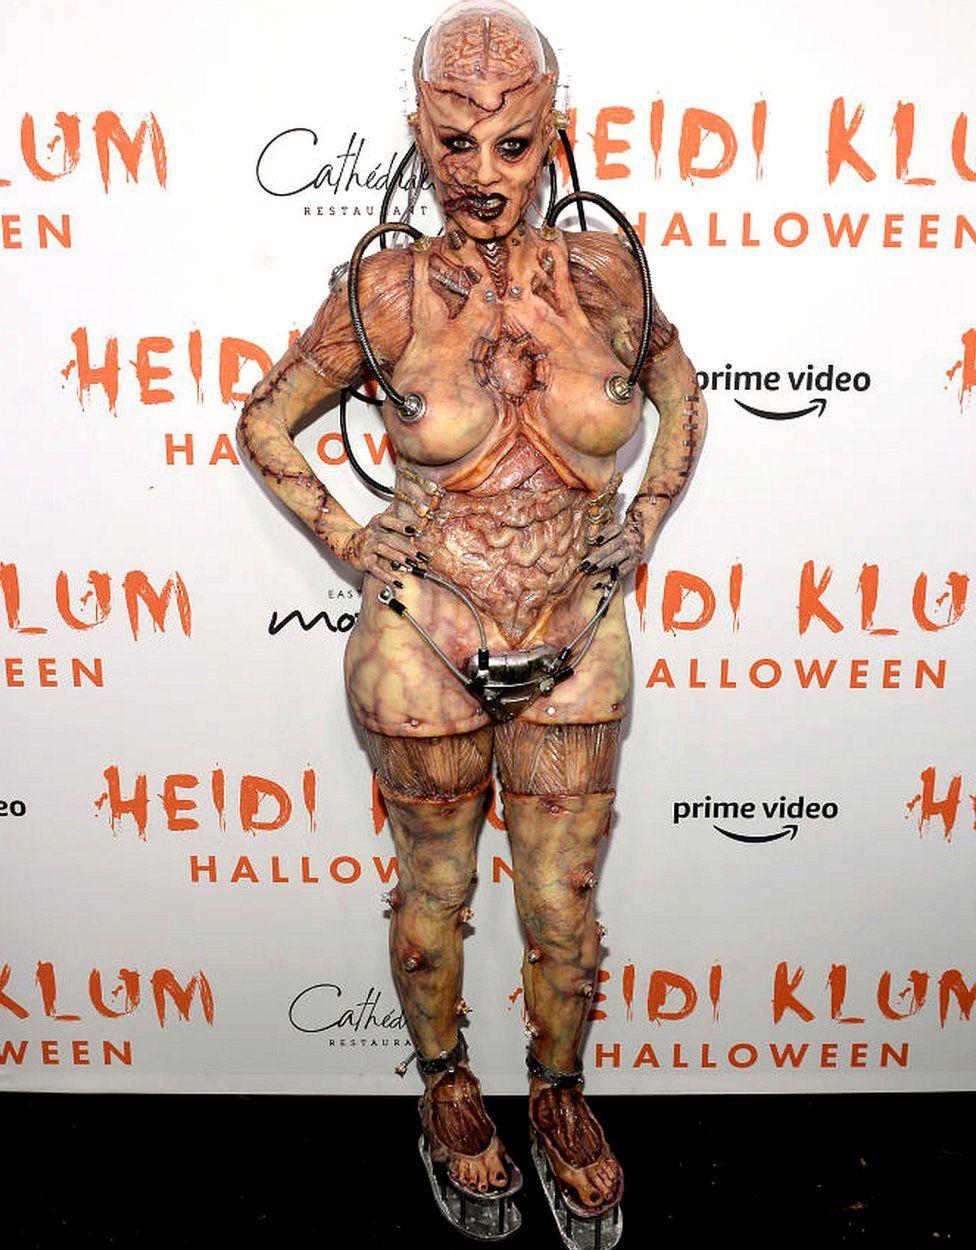 heidi-klum-celebrities-costumes-halloween-2019